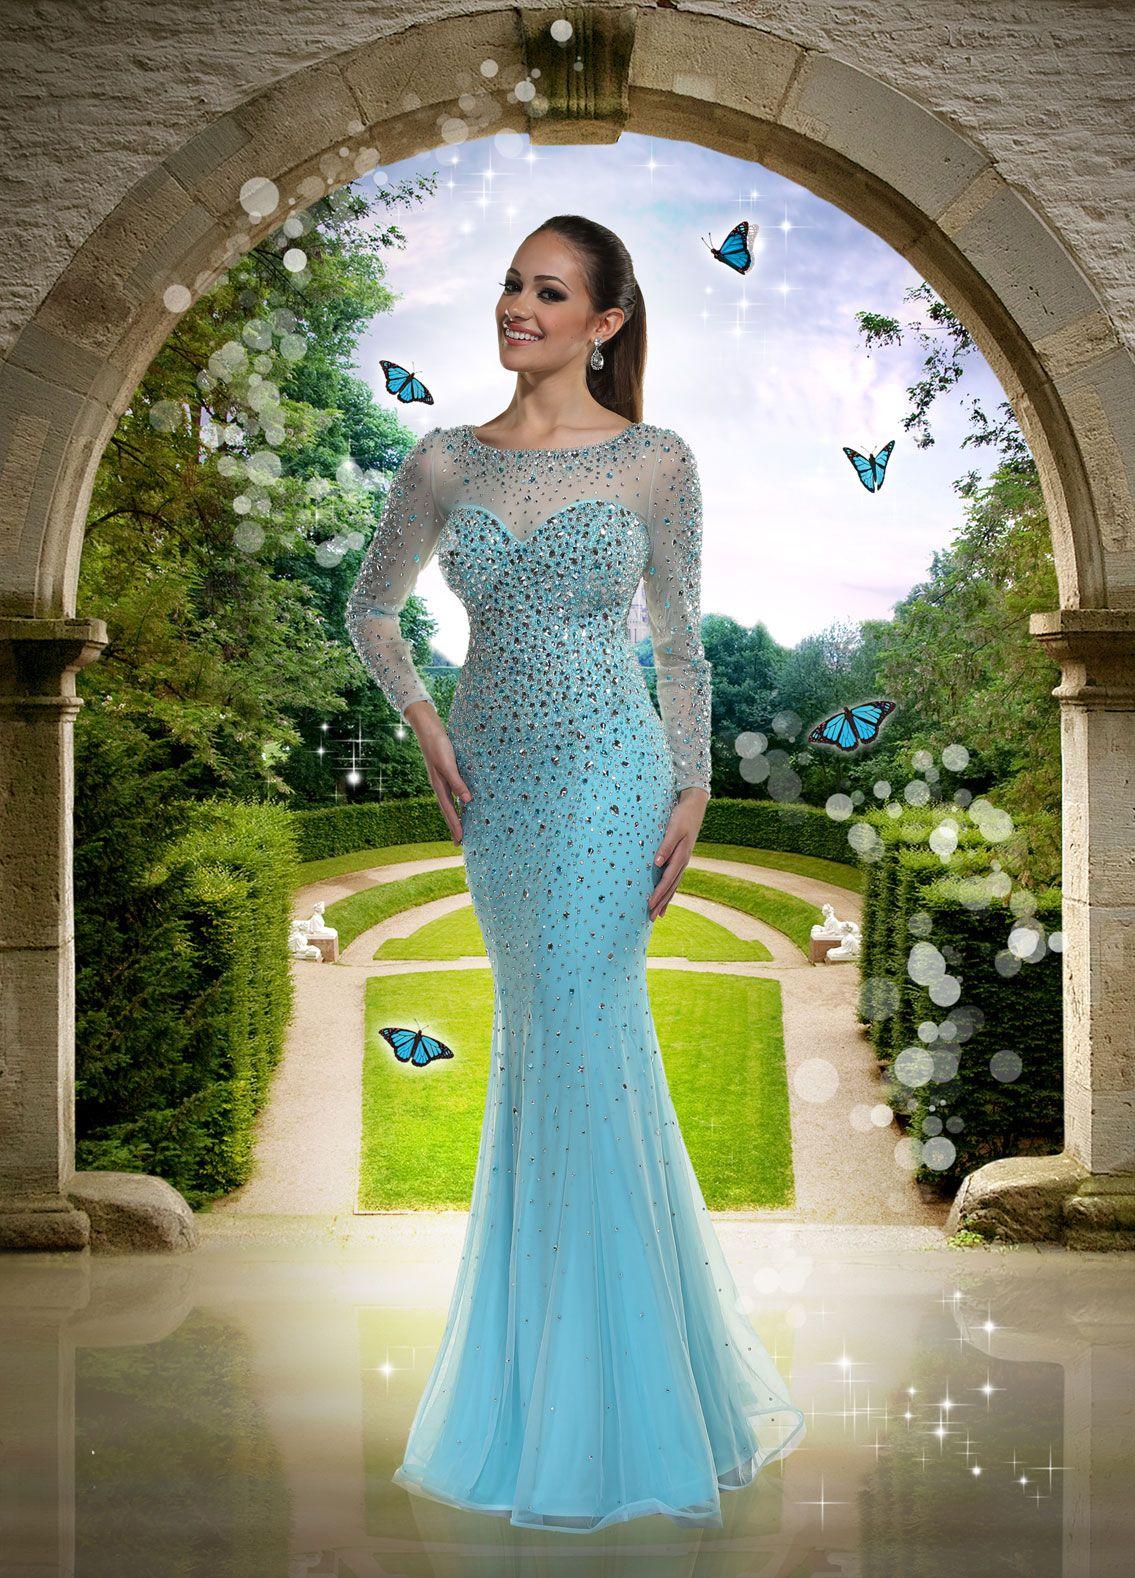 Elsa prom dress! | Dressed To Impress | Pinterest | Prom, Elsa and ...